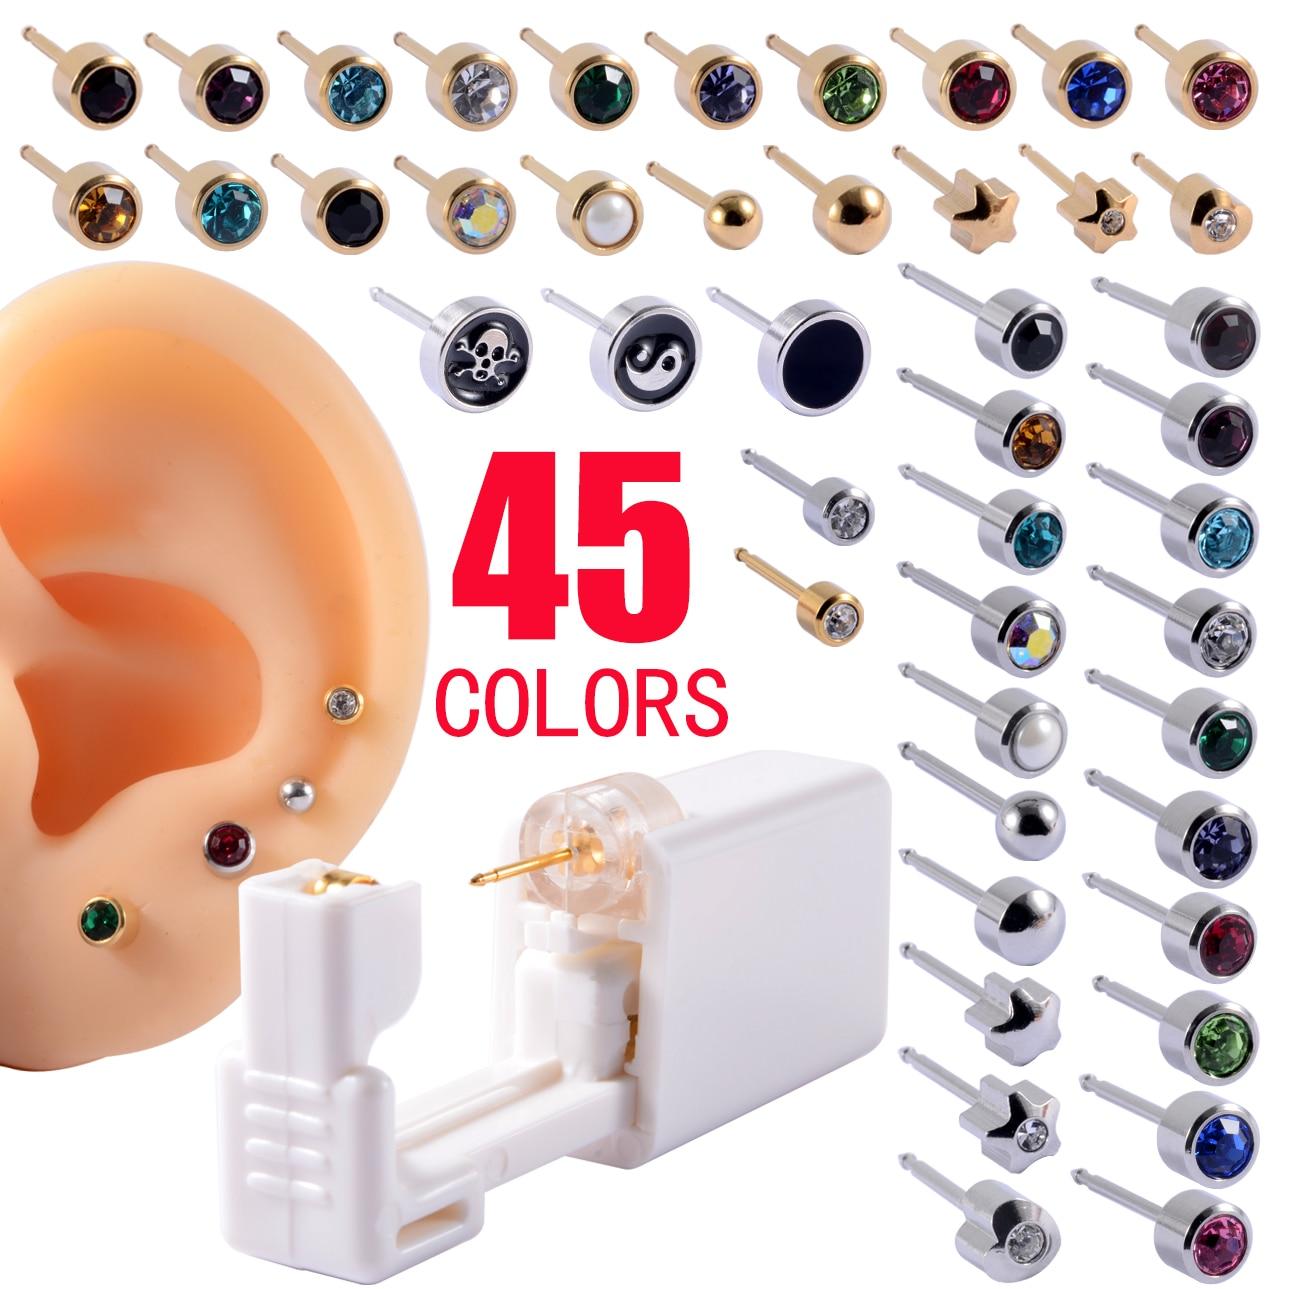 1PC Disposable Sterile Ear Piercing Unit Cartilage Tragus Helix Piercing Gun NO PAIN Piercer Tool Machine Kit Stud Ball Earrings 1